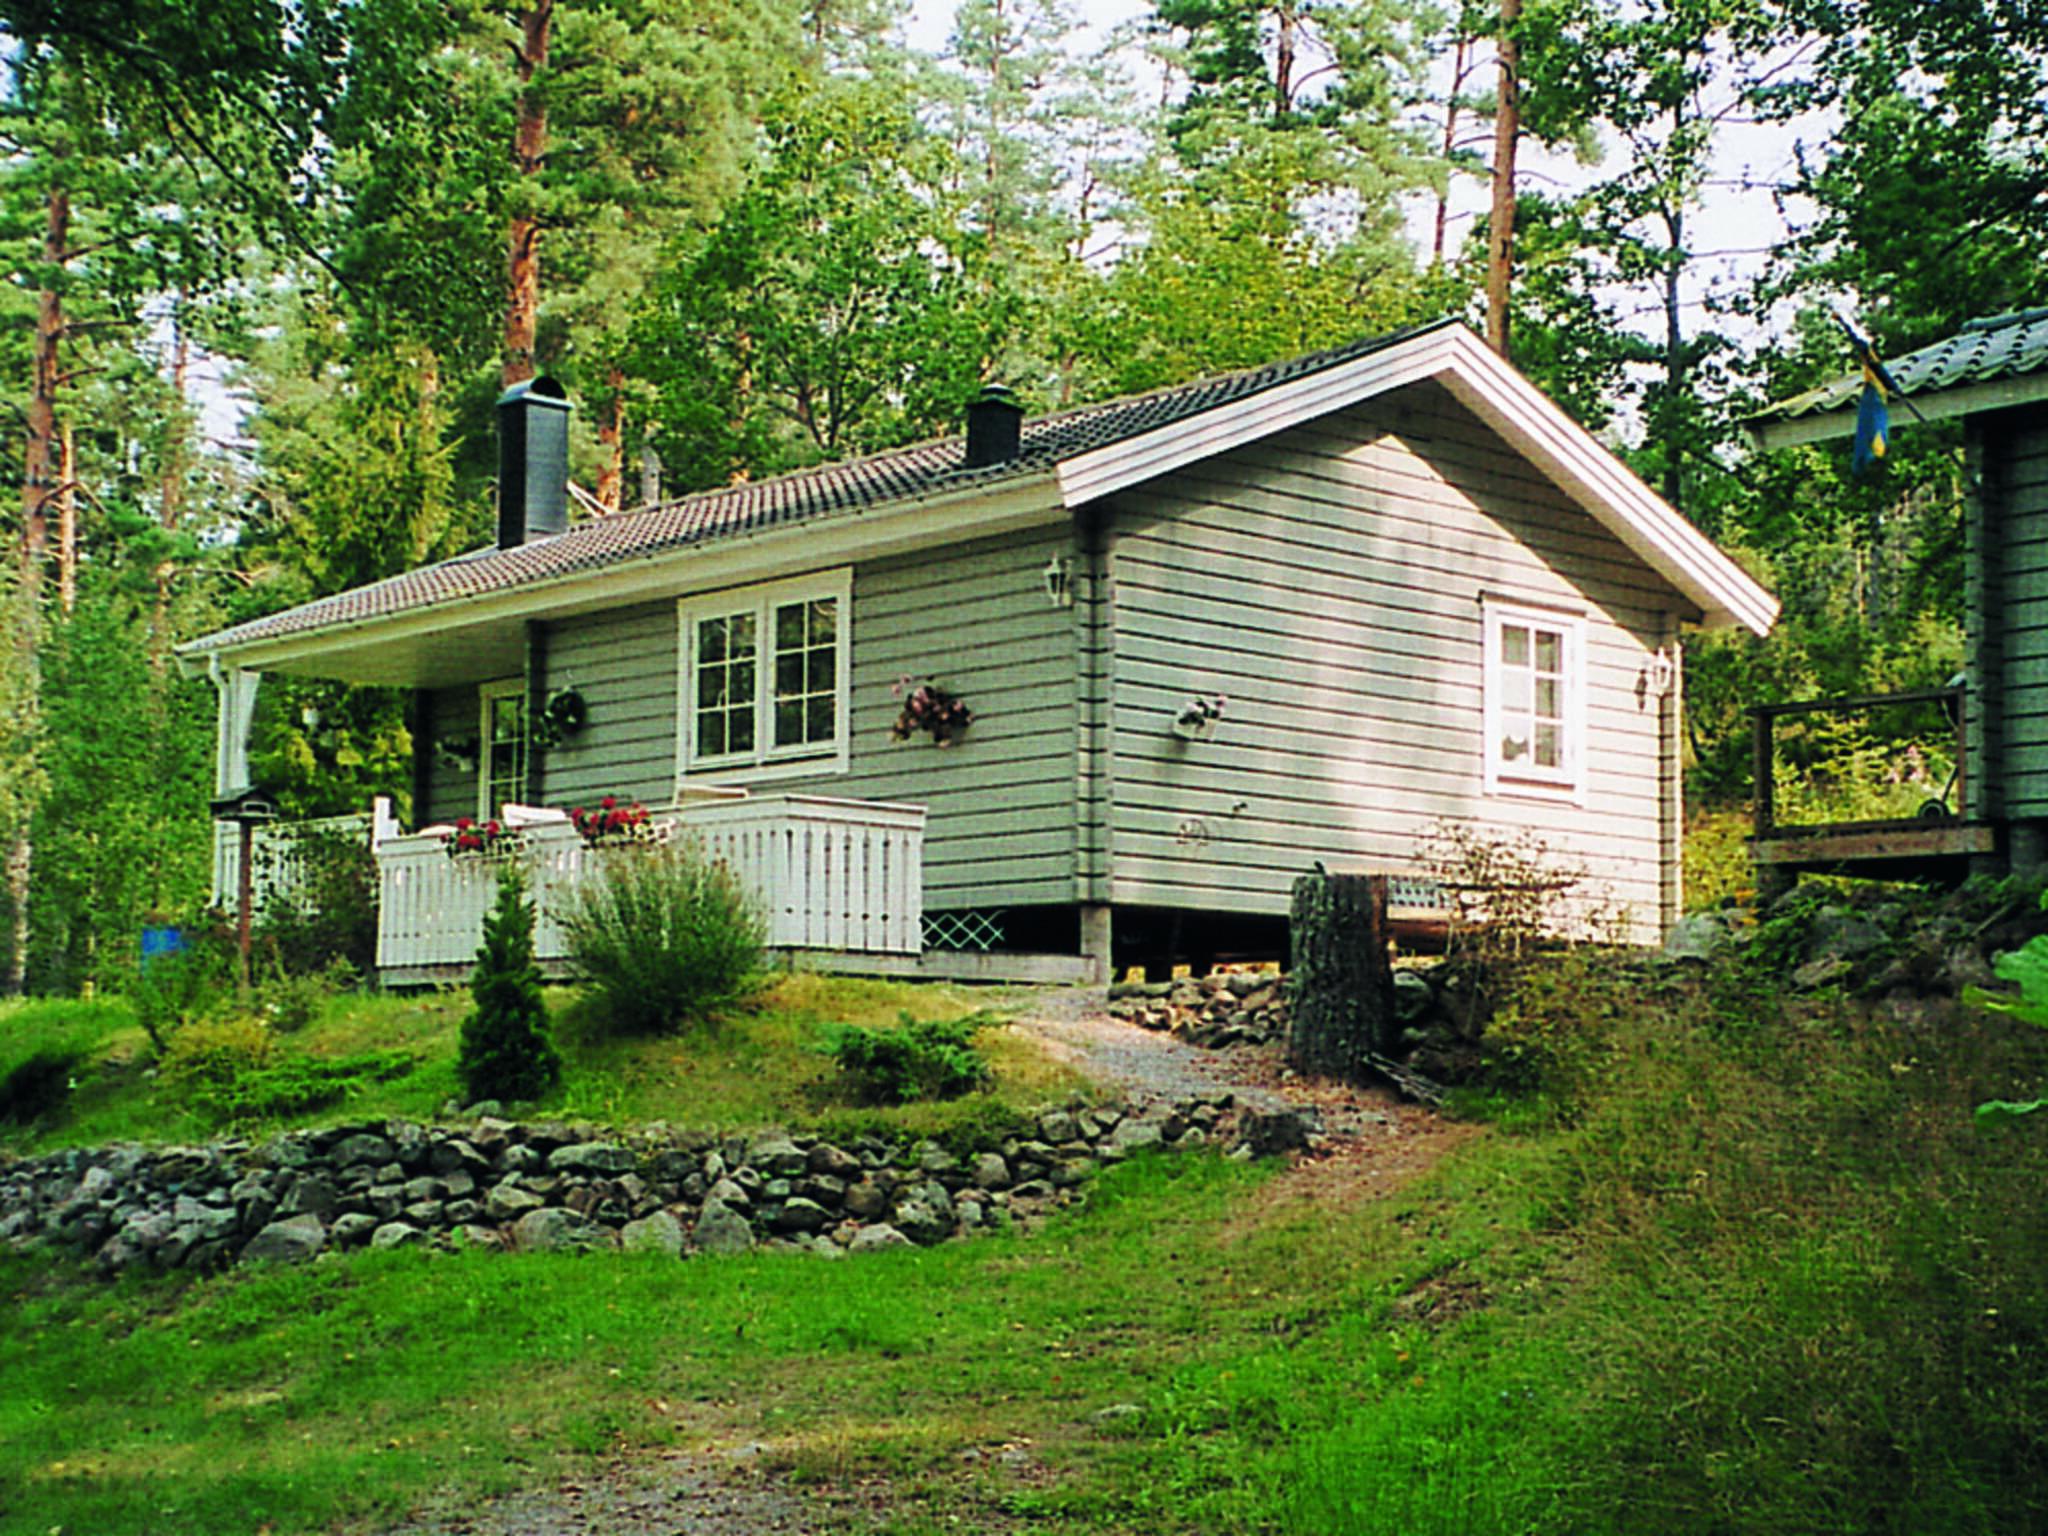 Ferienhaus Valdemarsvik (84743), Valdemarsvik, Östergötlands län, Südschweden, Schweden, Bild 12